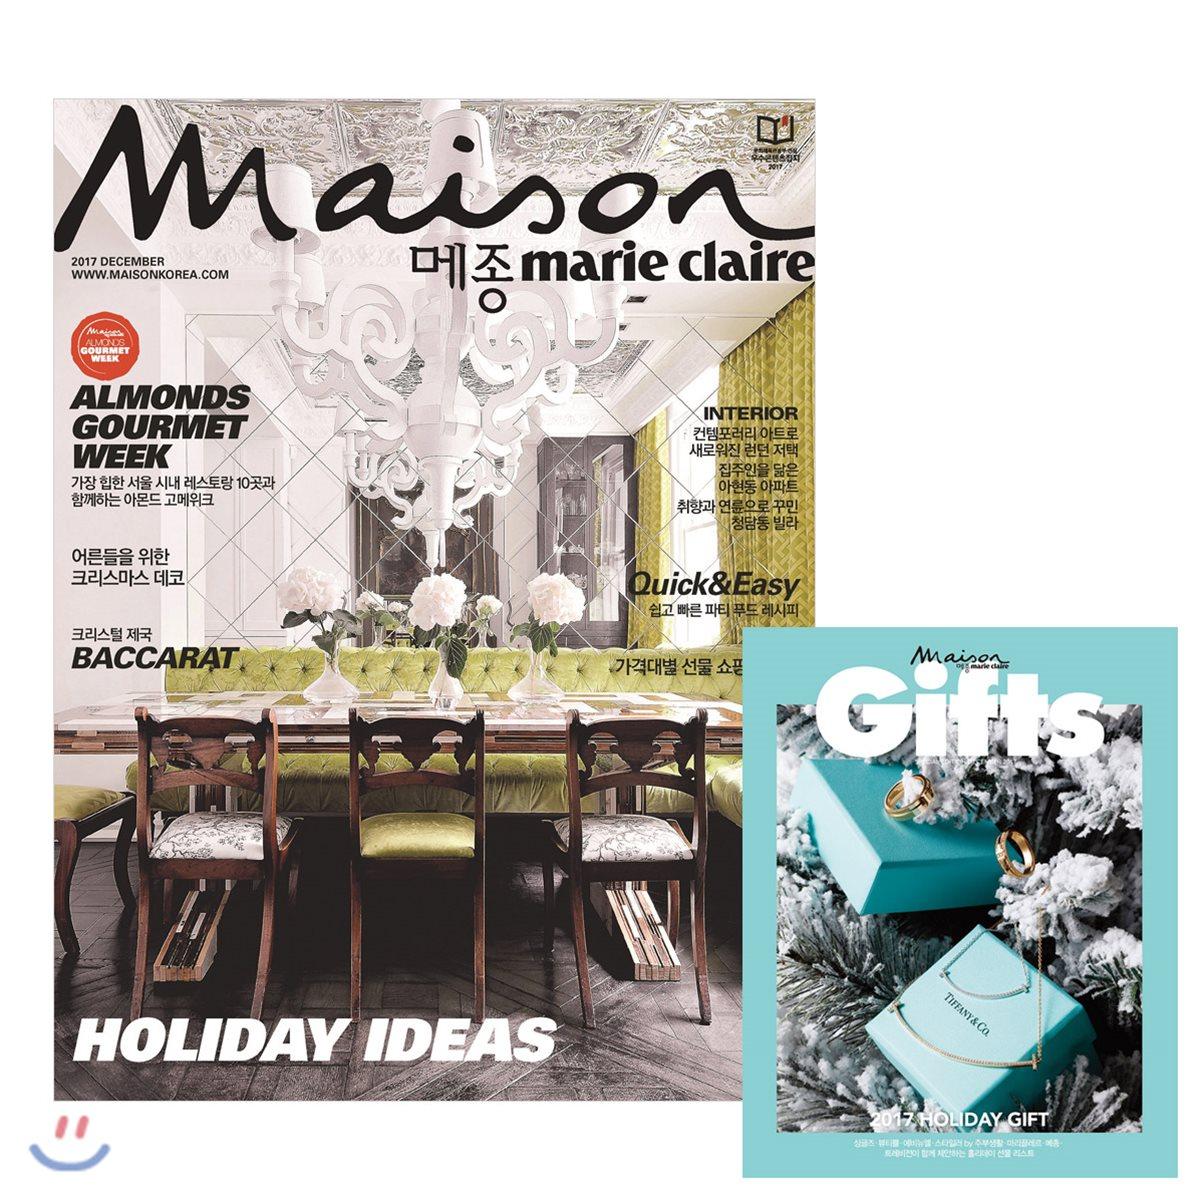 Maison 메종 B형 (여성월간) : 12월 [2017]